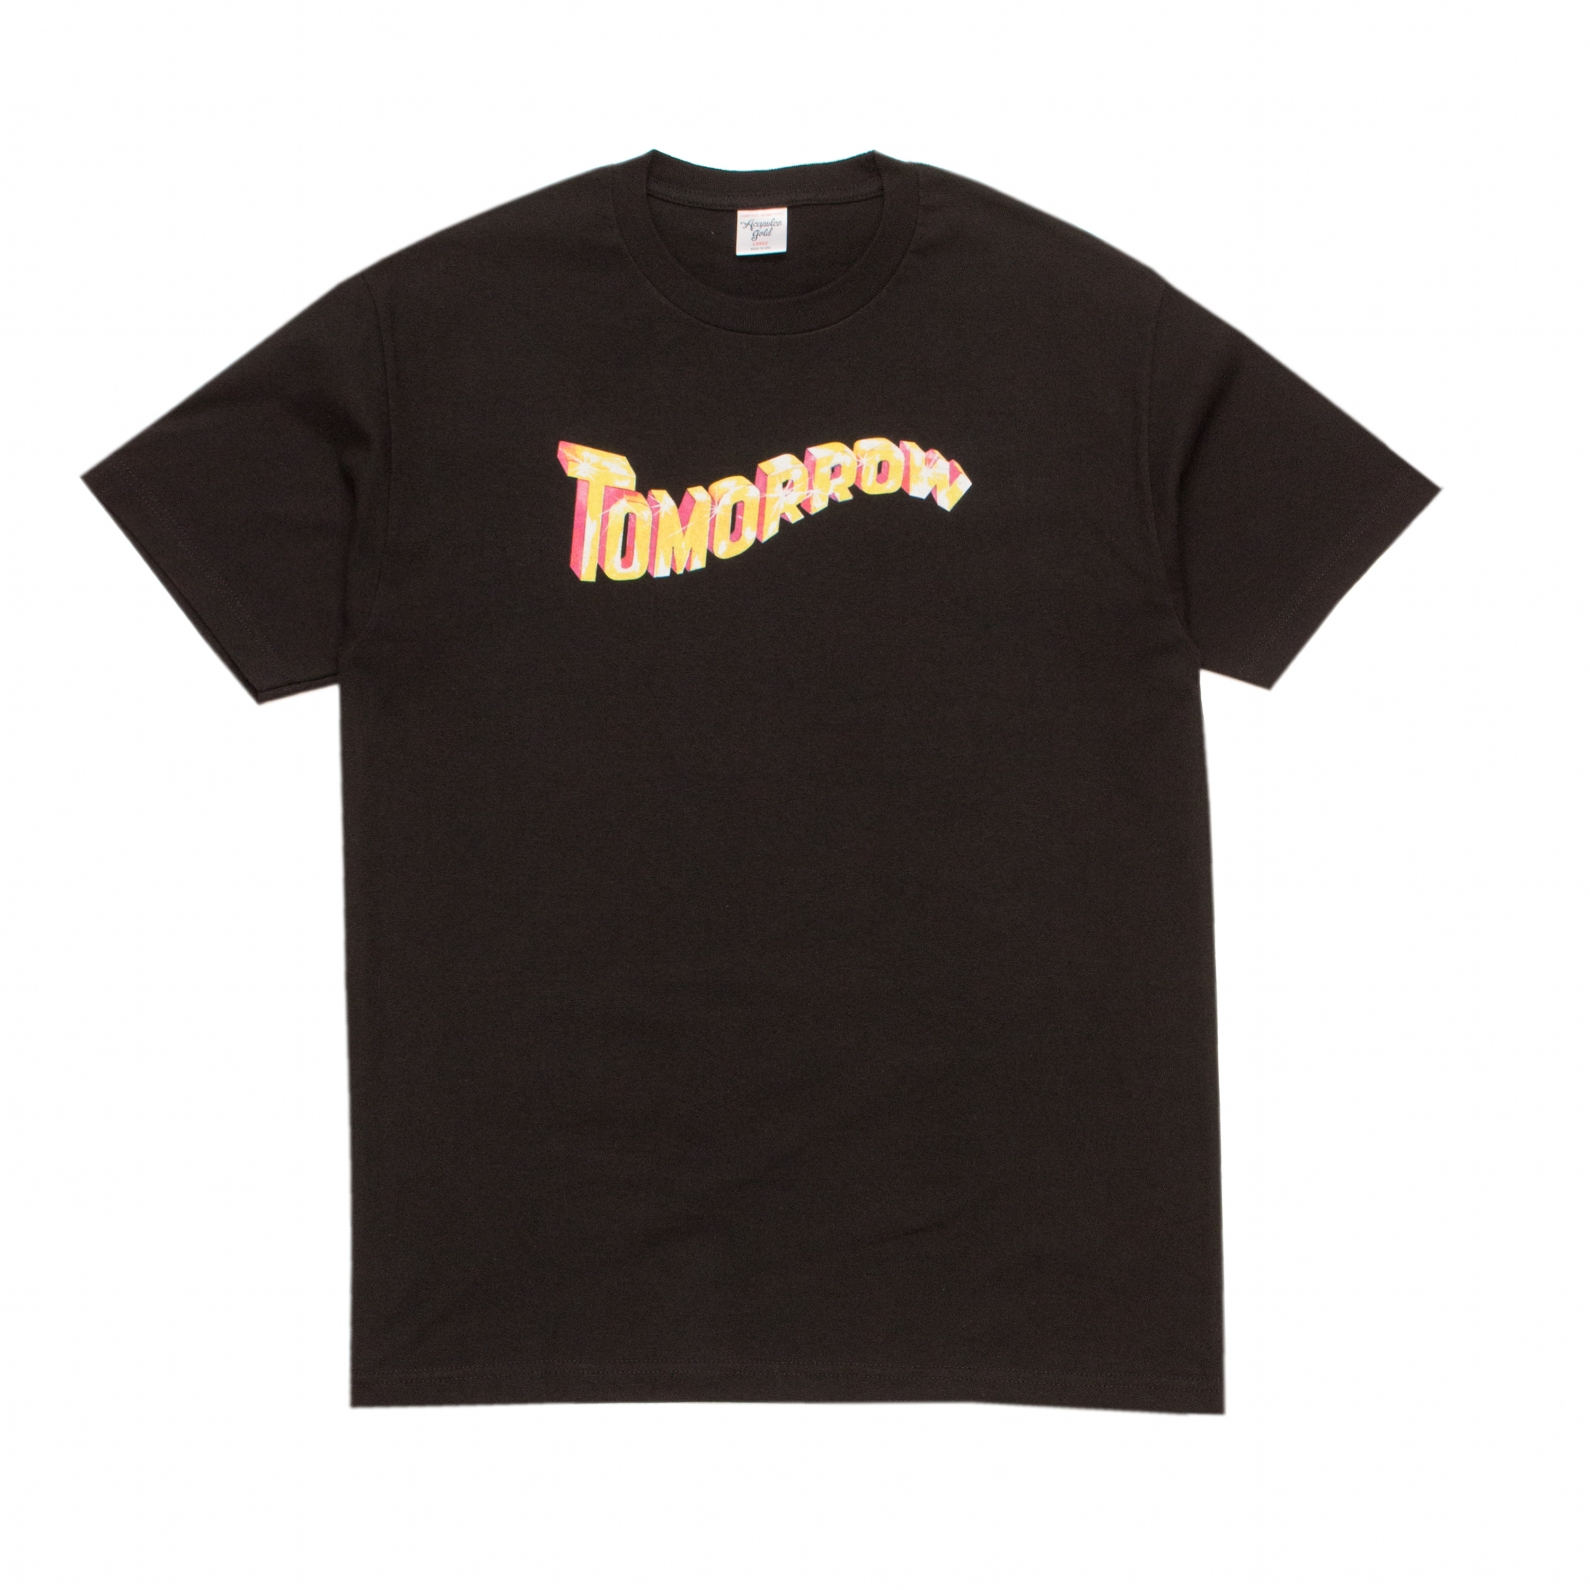 【ACAPULCO GOLD/アカプルコ ゴールド】NO ONE KNOWS TEE Tシャツ / BLACK